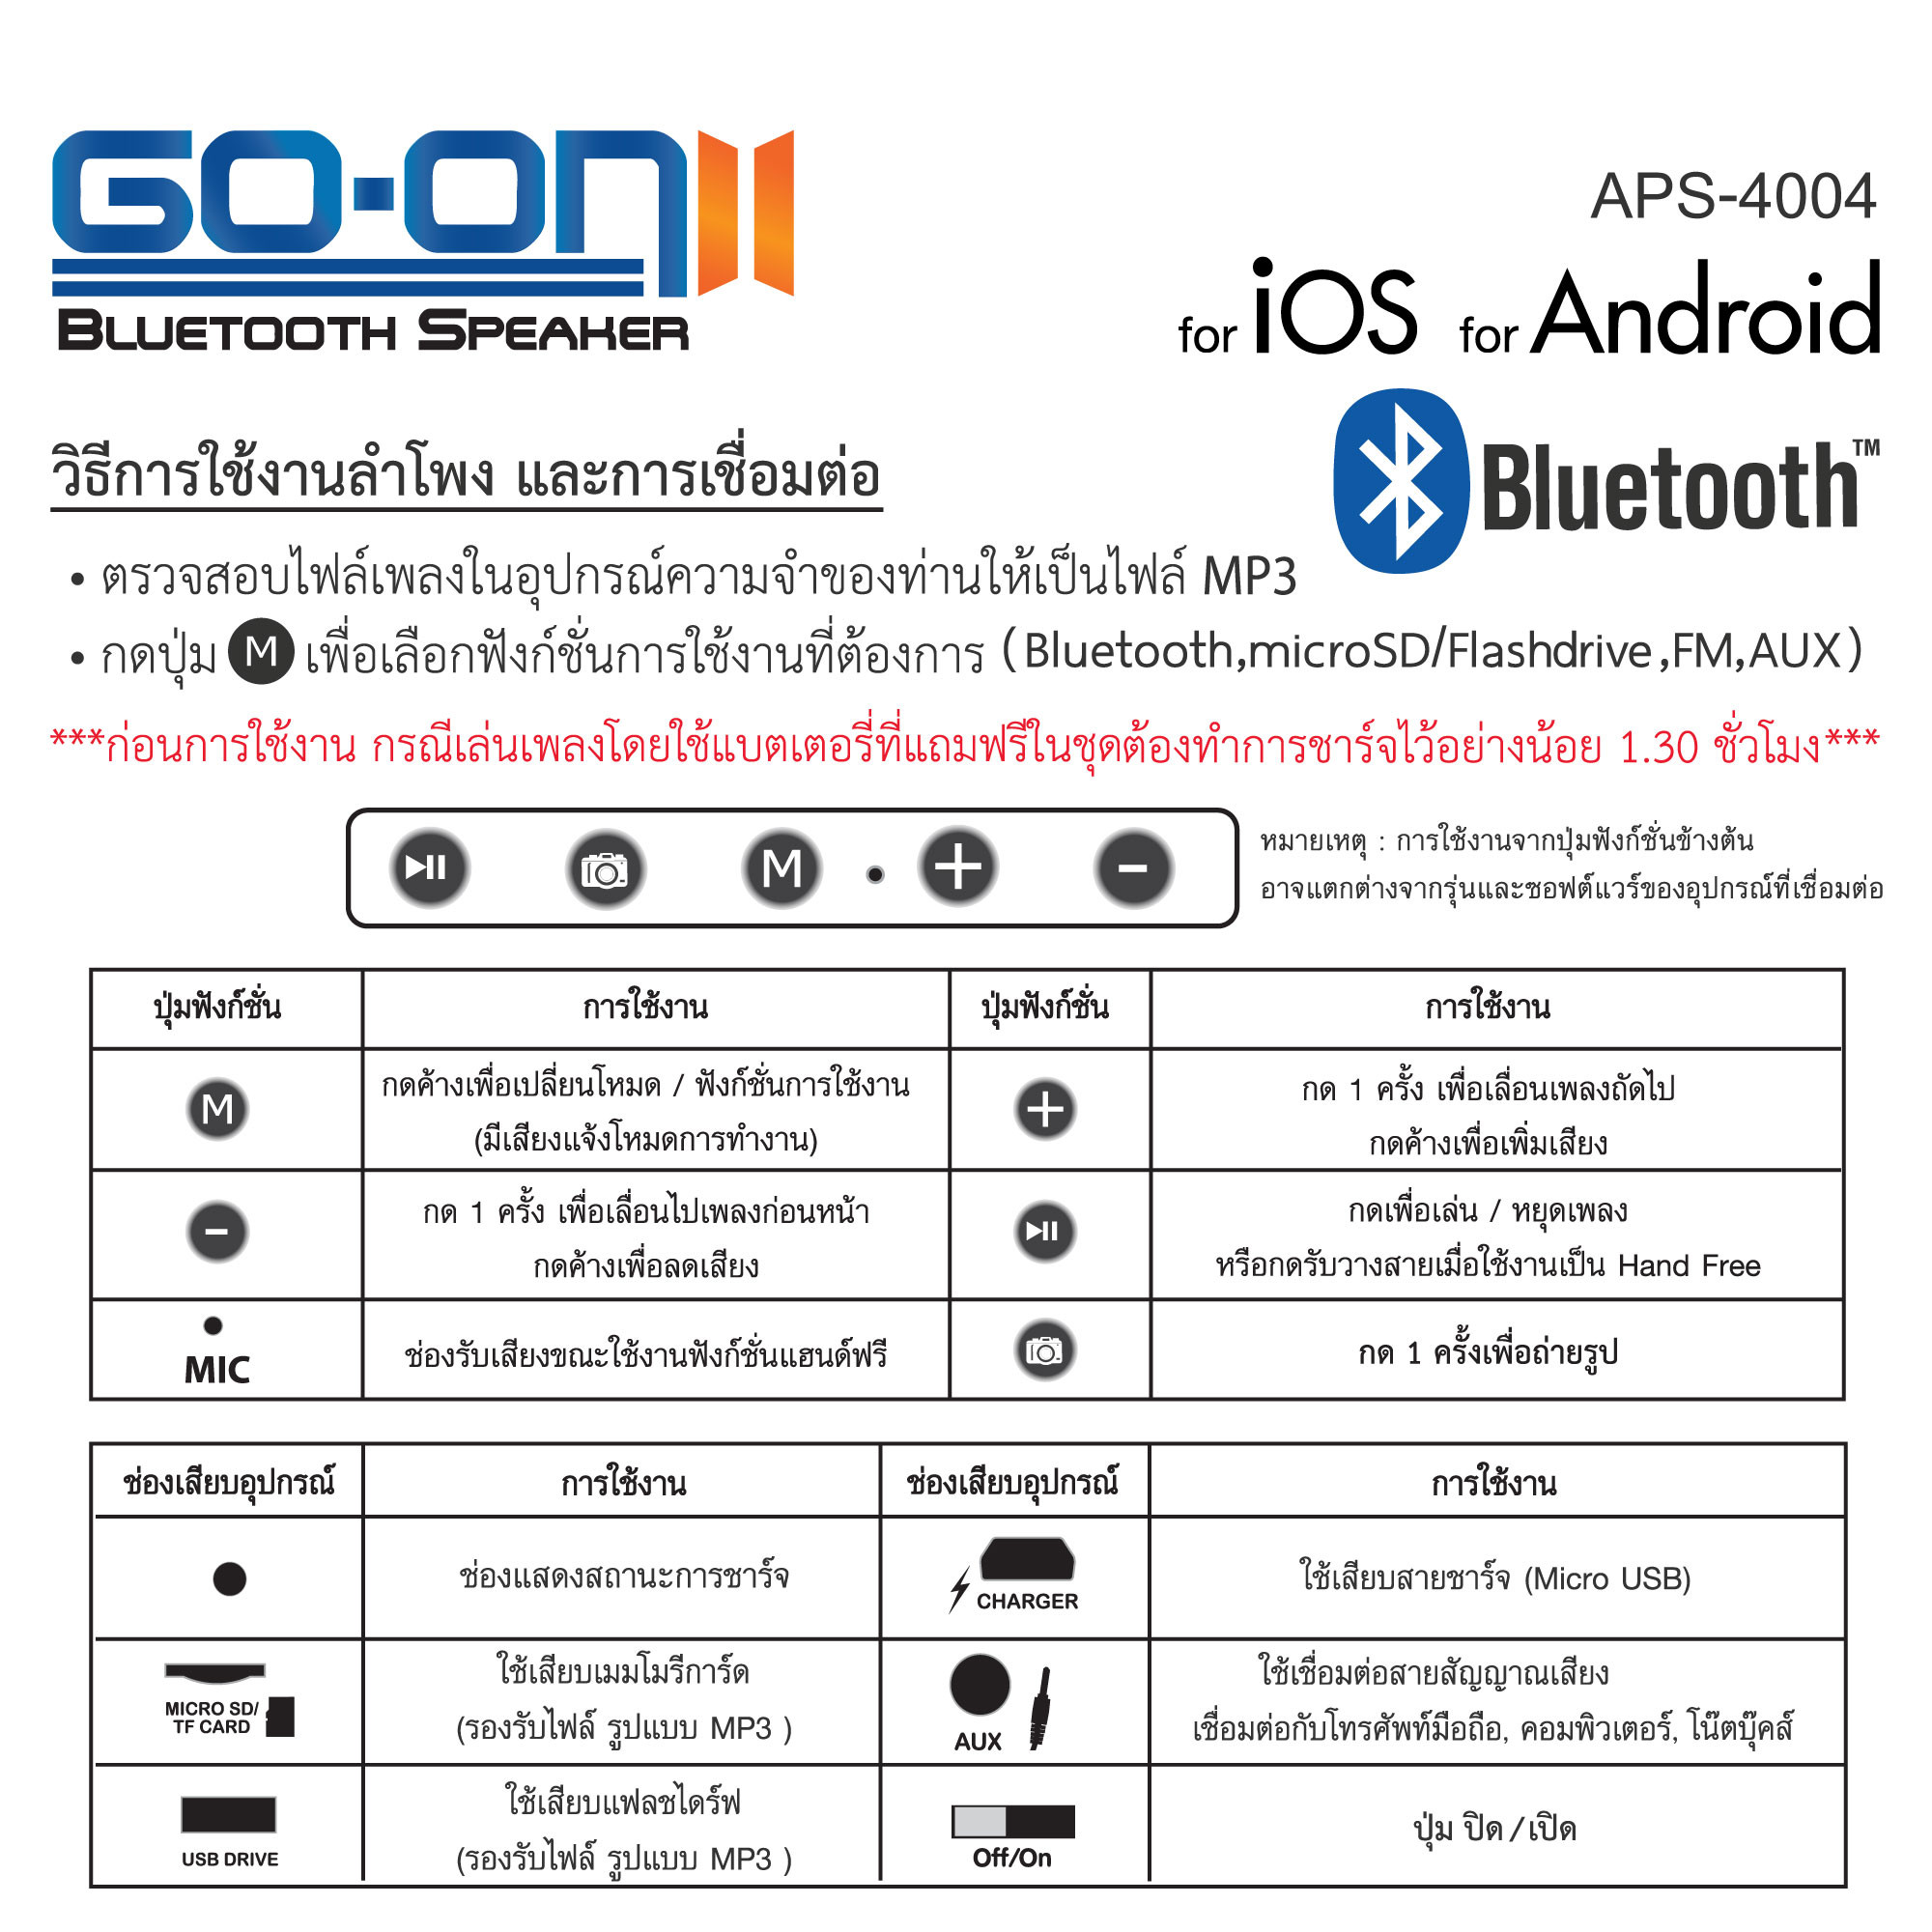 spec2-aps4004.jpg